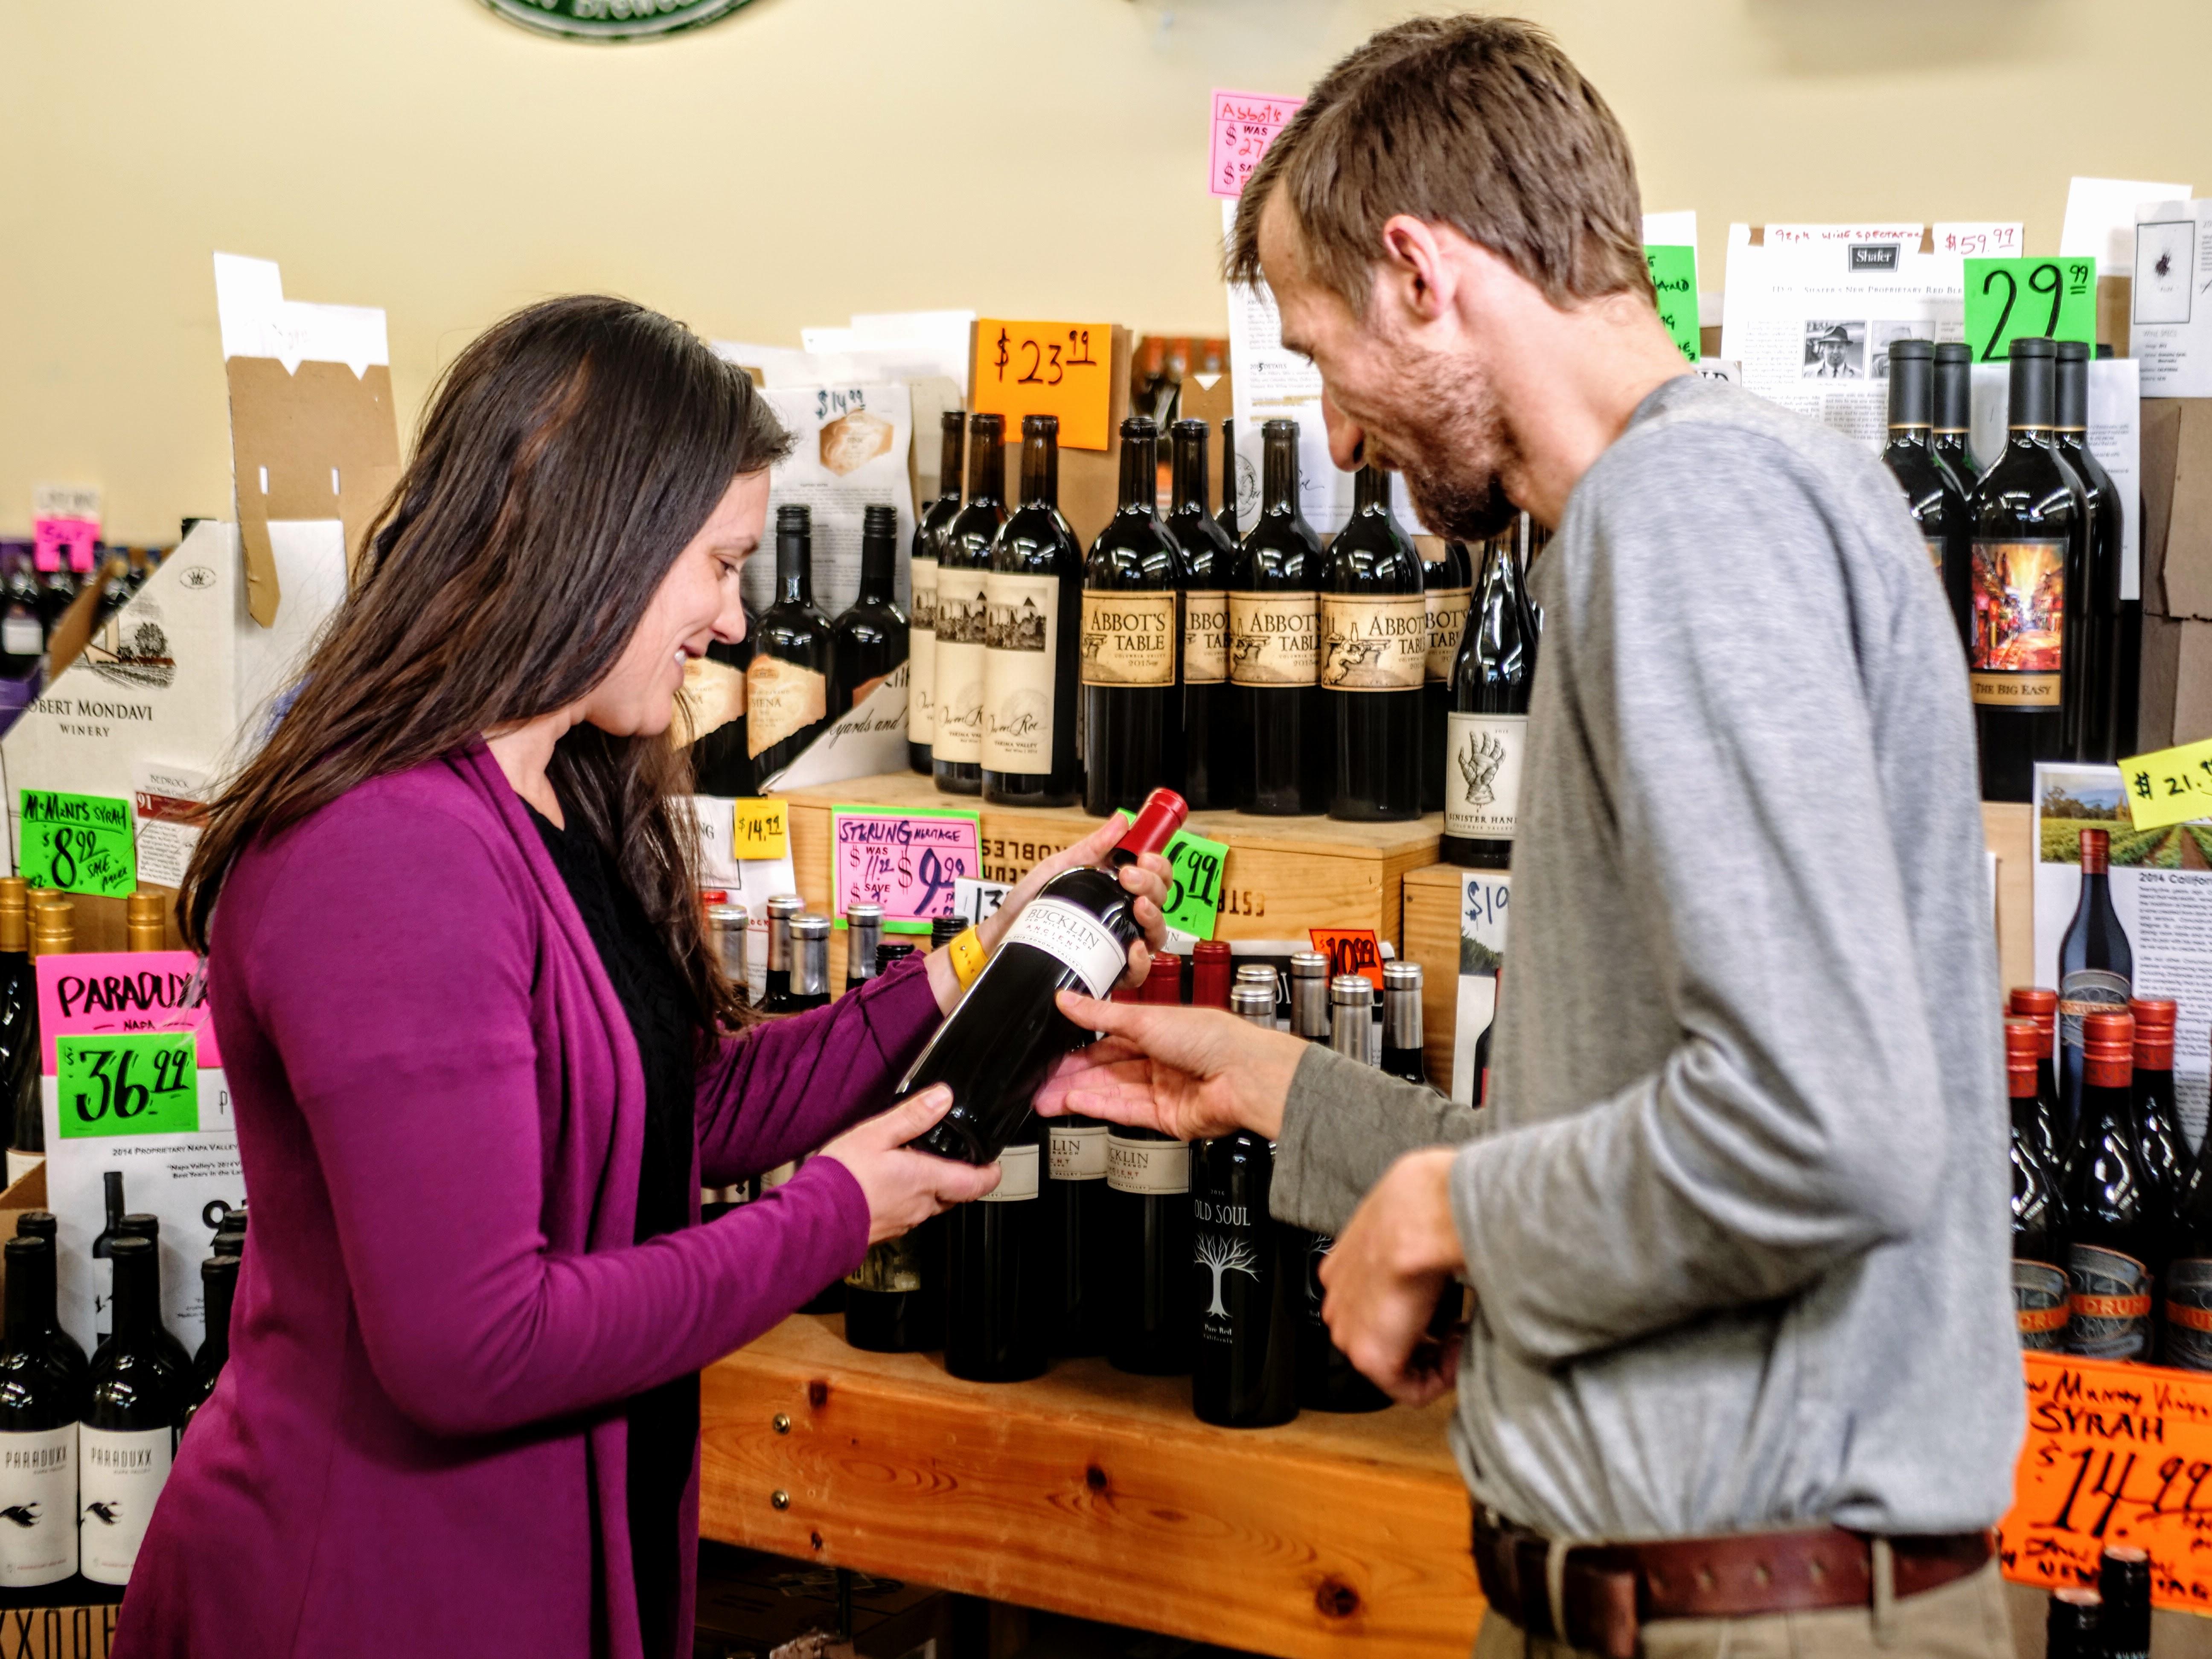 PJ's Associate helping customer find wine